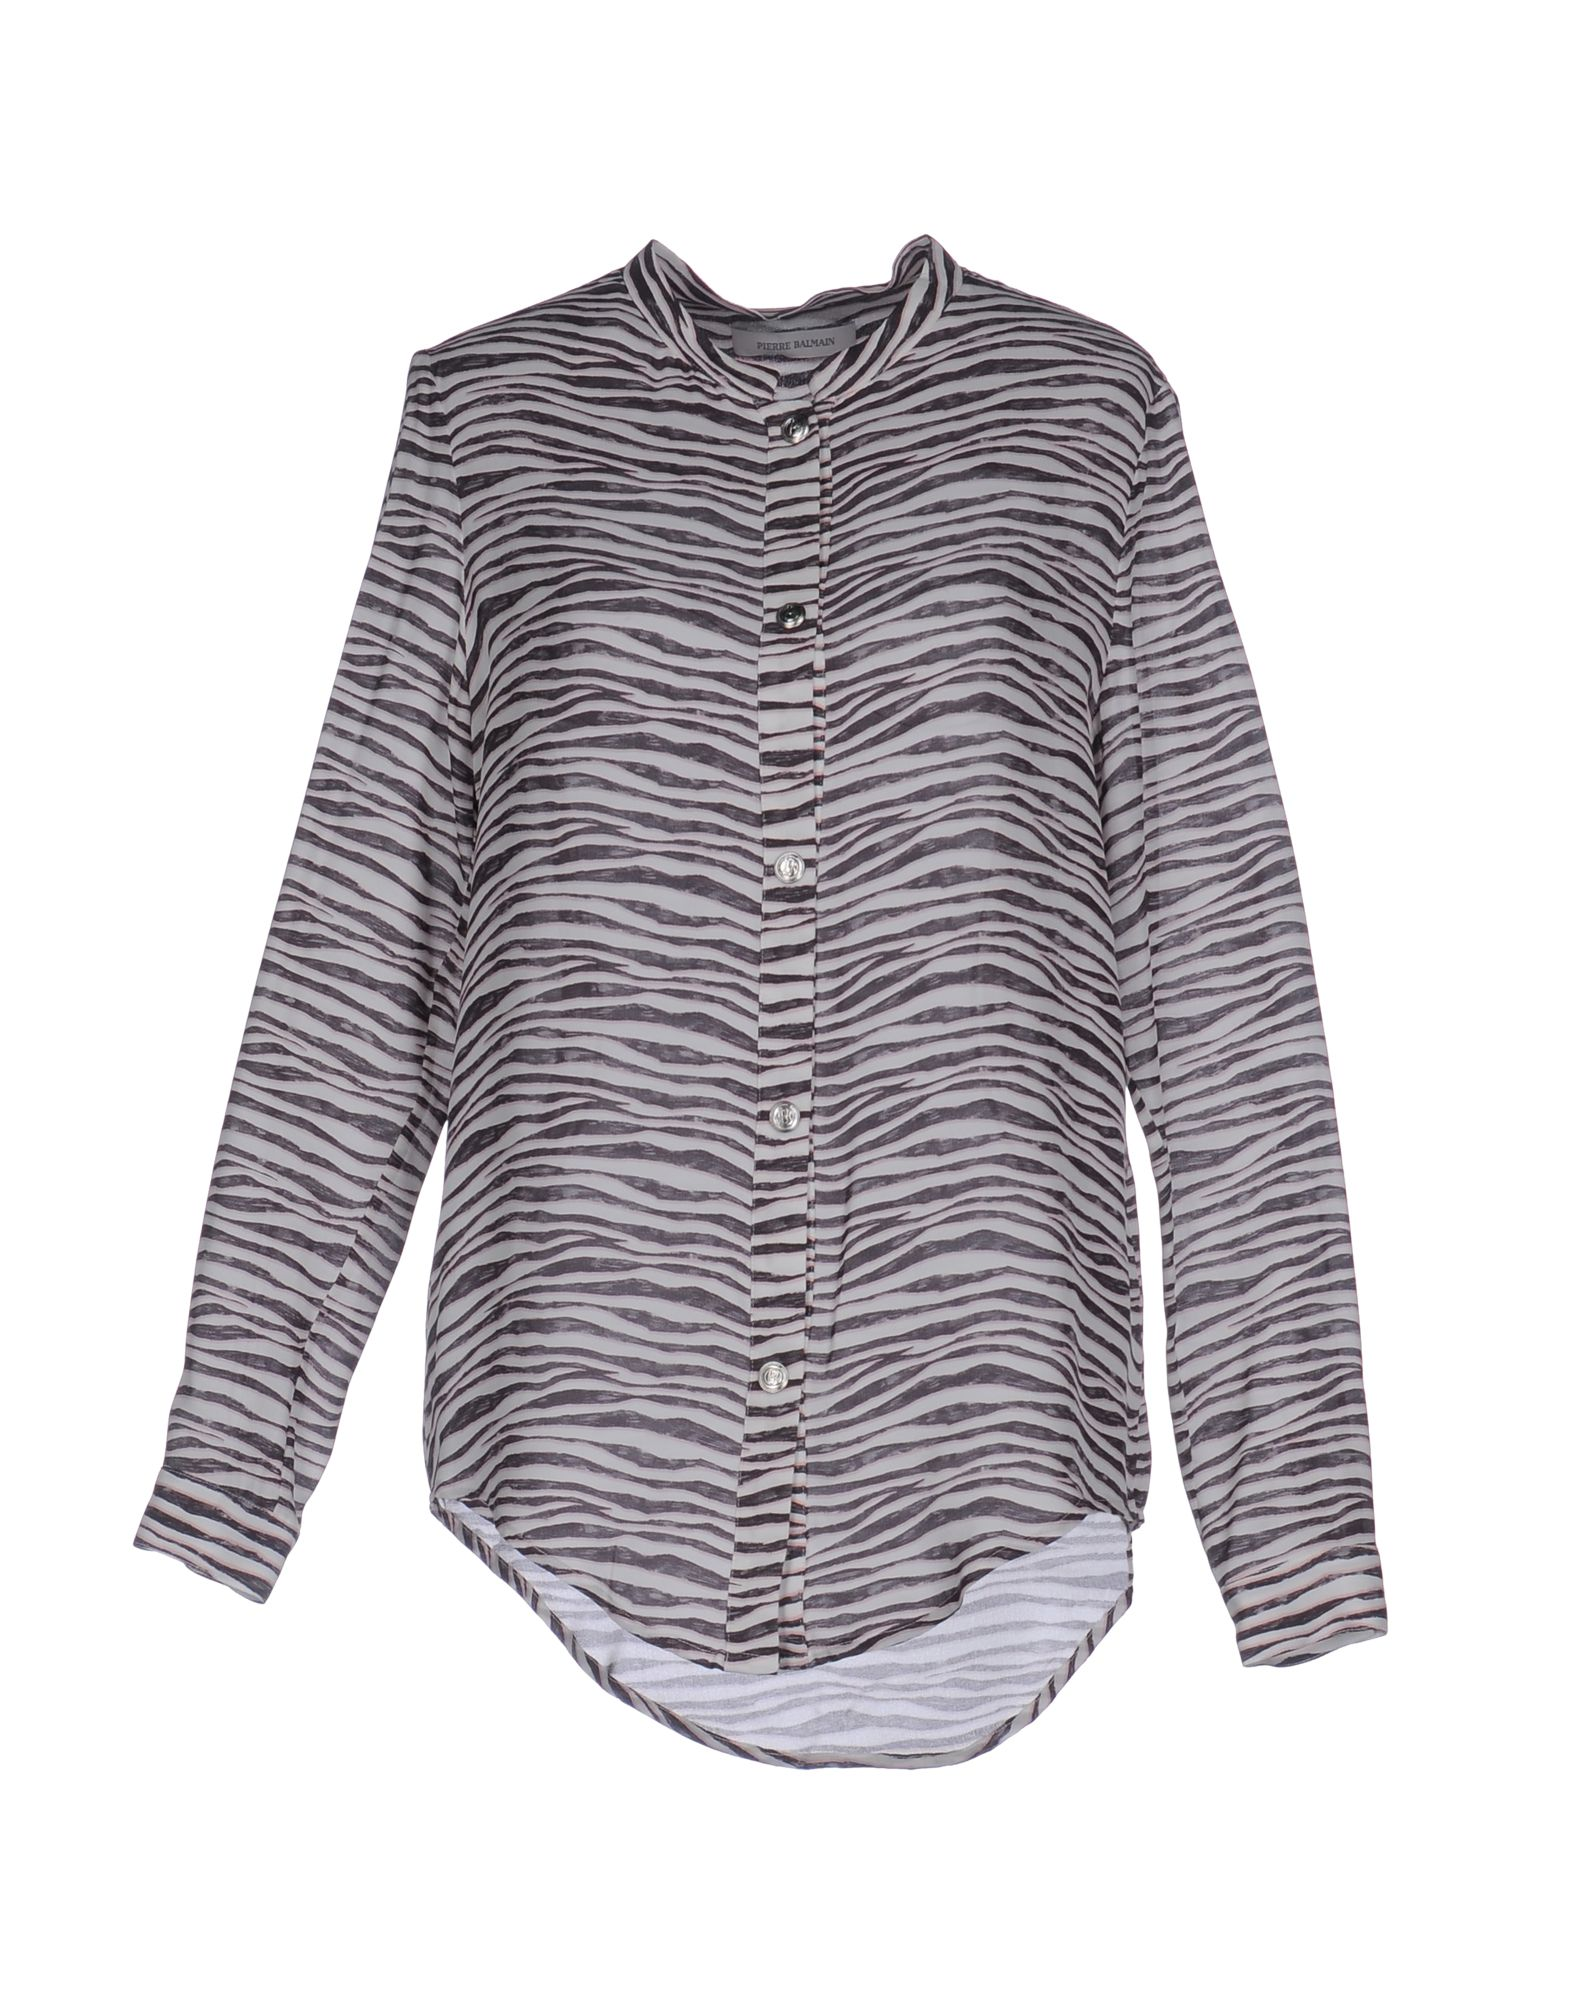 Camicie  E bluse bluse bluse Fantasia Pierre Balmain donna - 38636387FB c9c